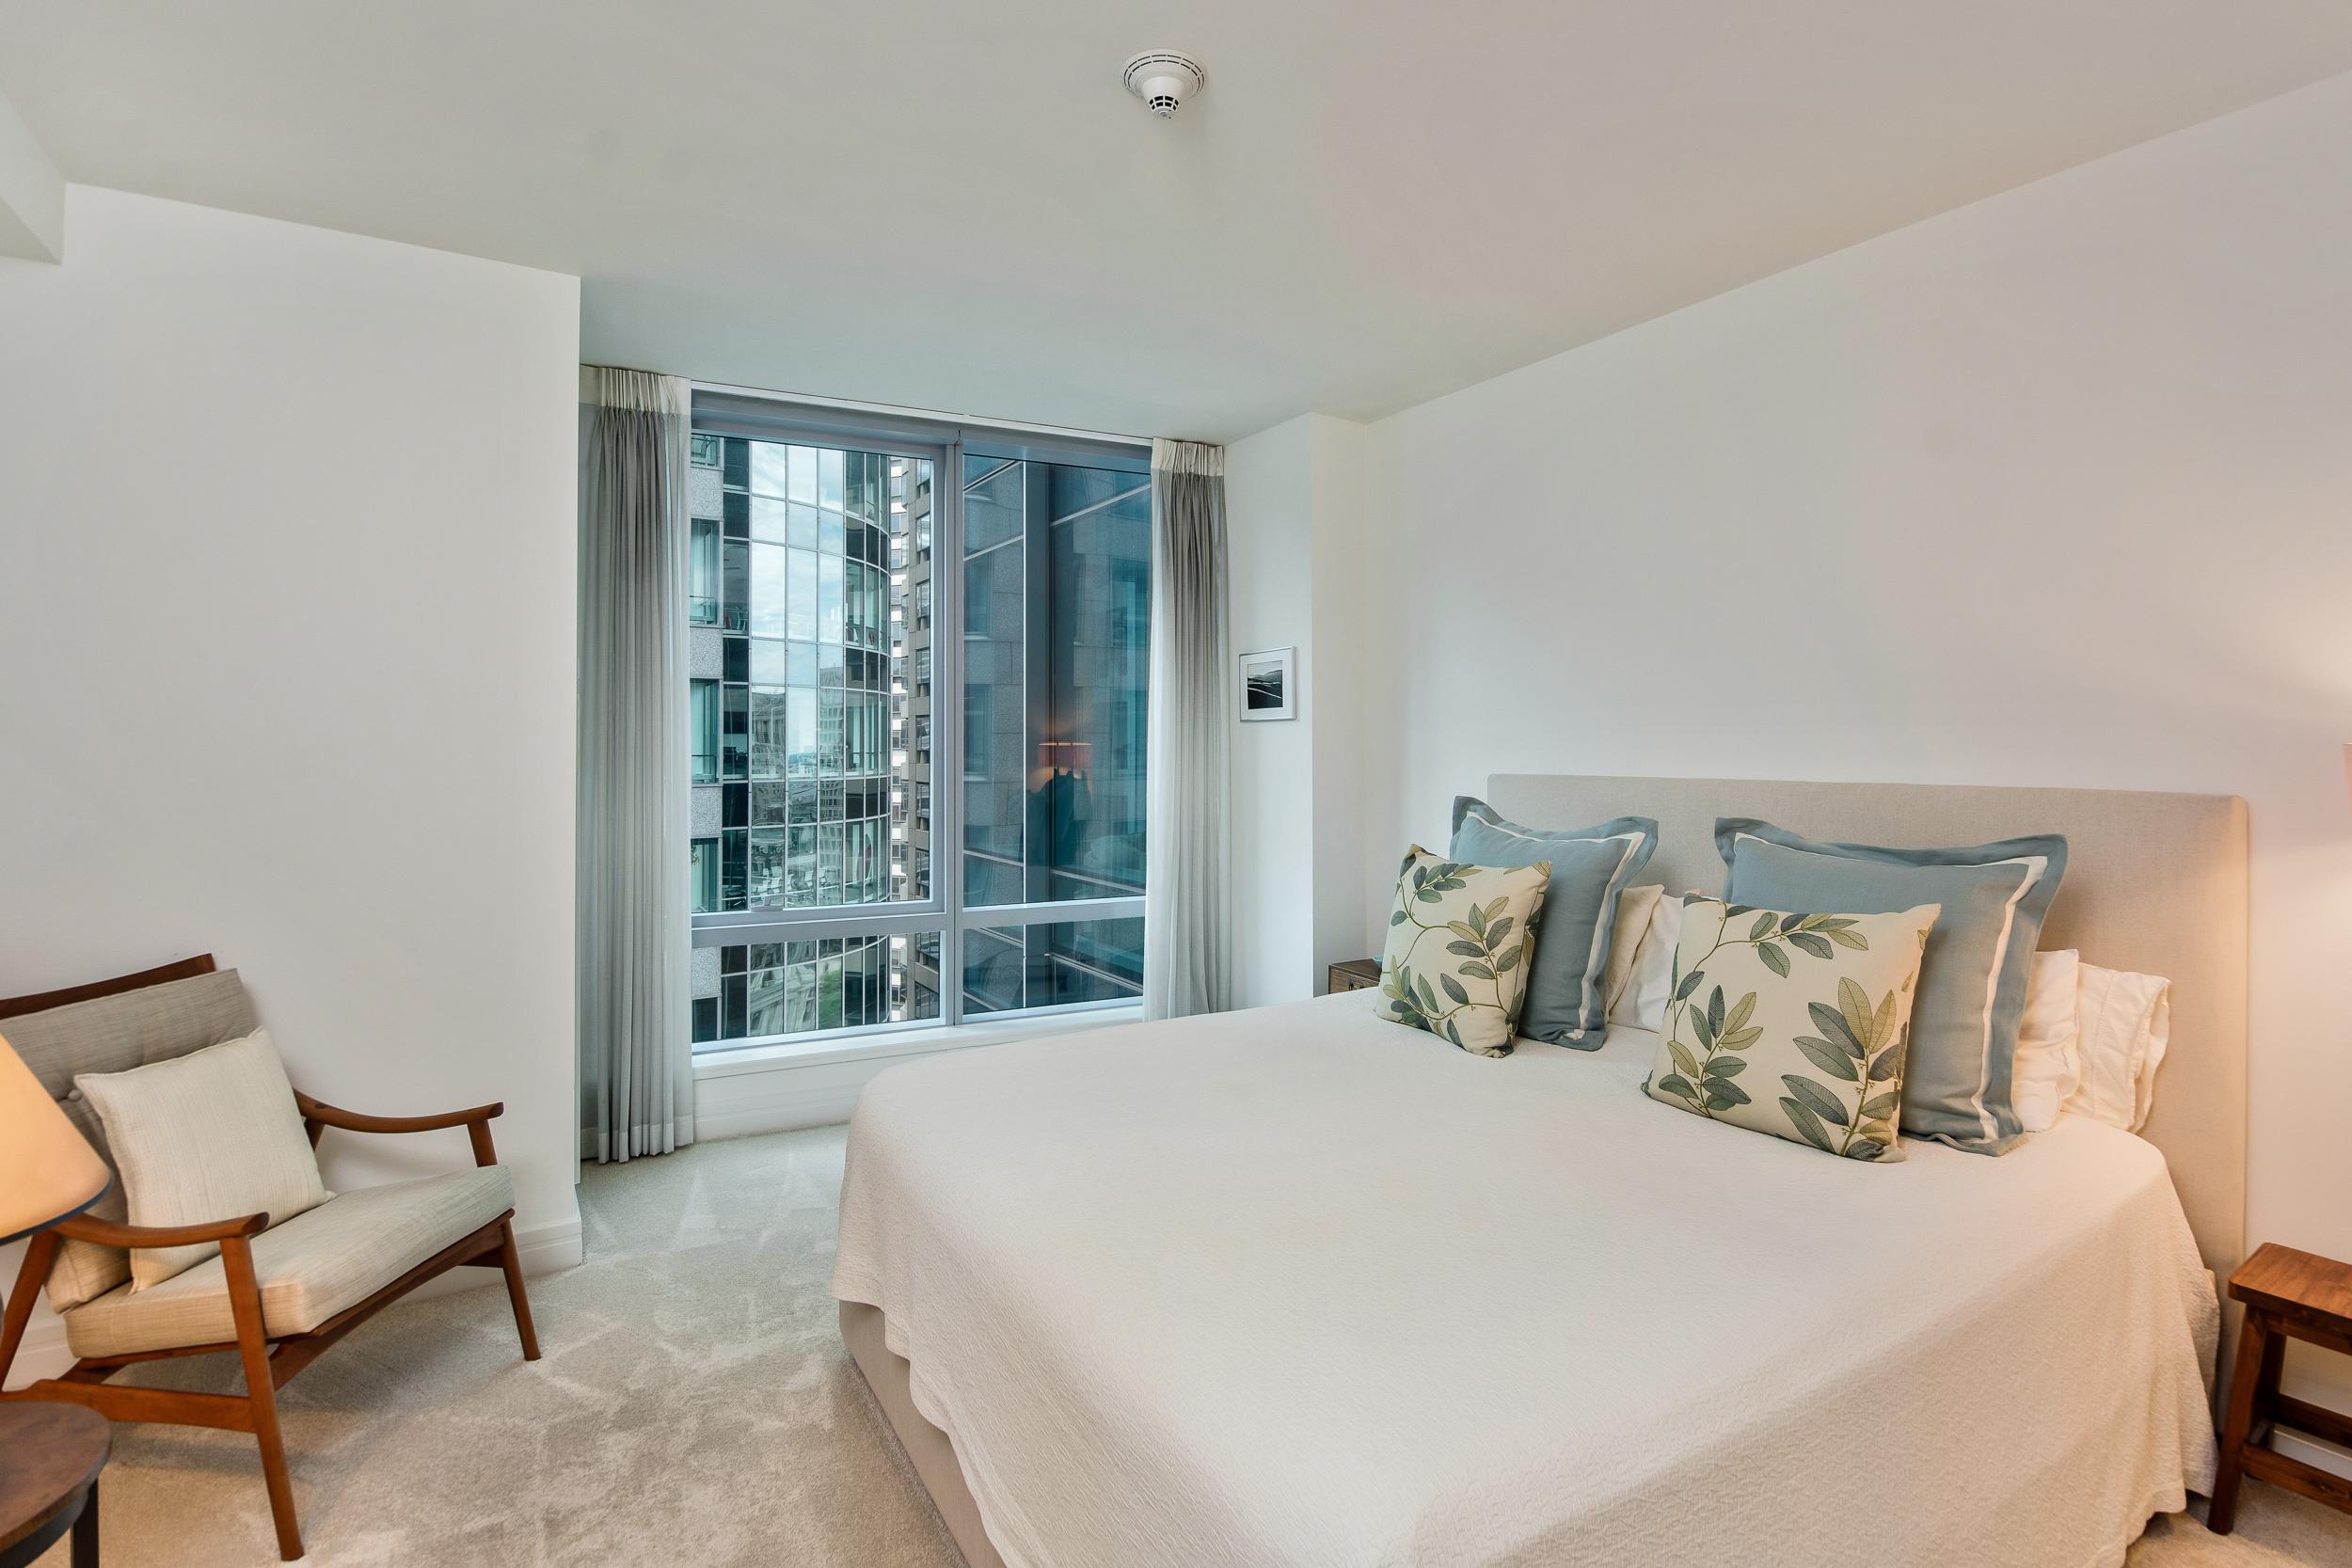 Philadelphia Luxury Home Condo-the ritz carlton residences 20H bryant wilde realty6.jpg